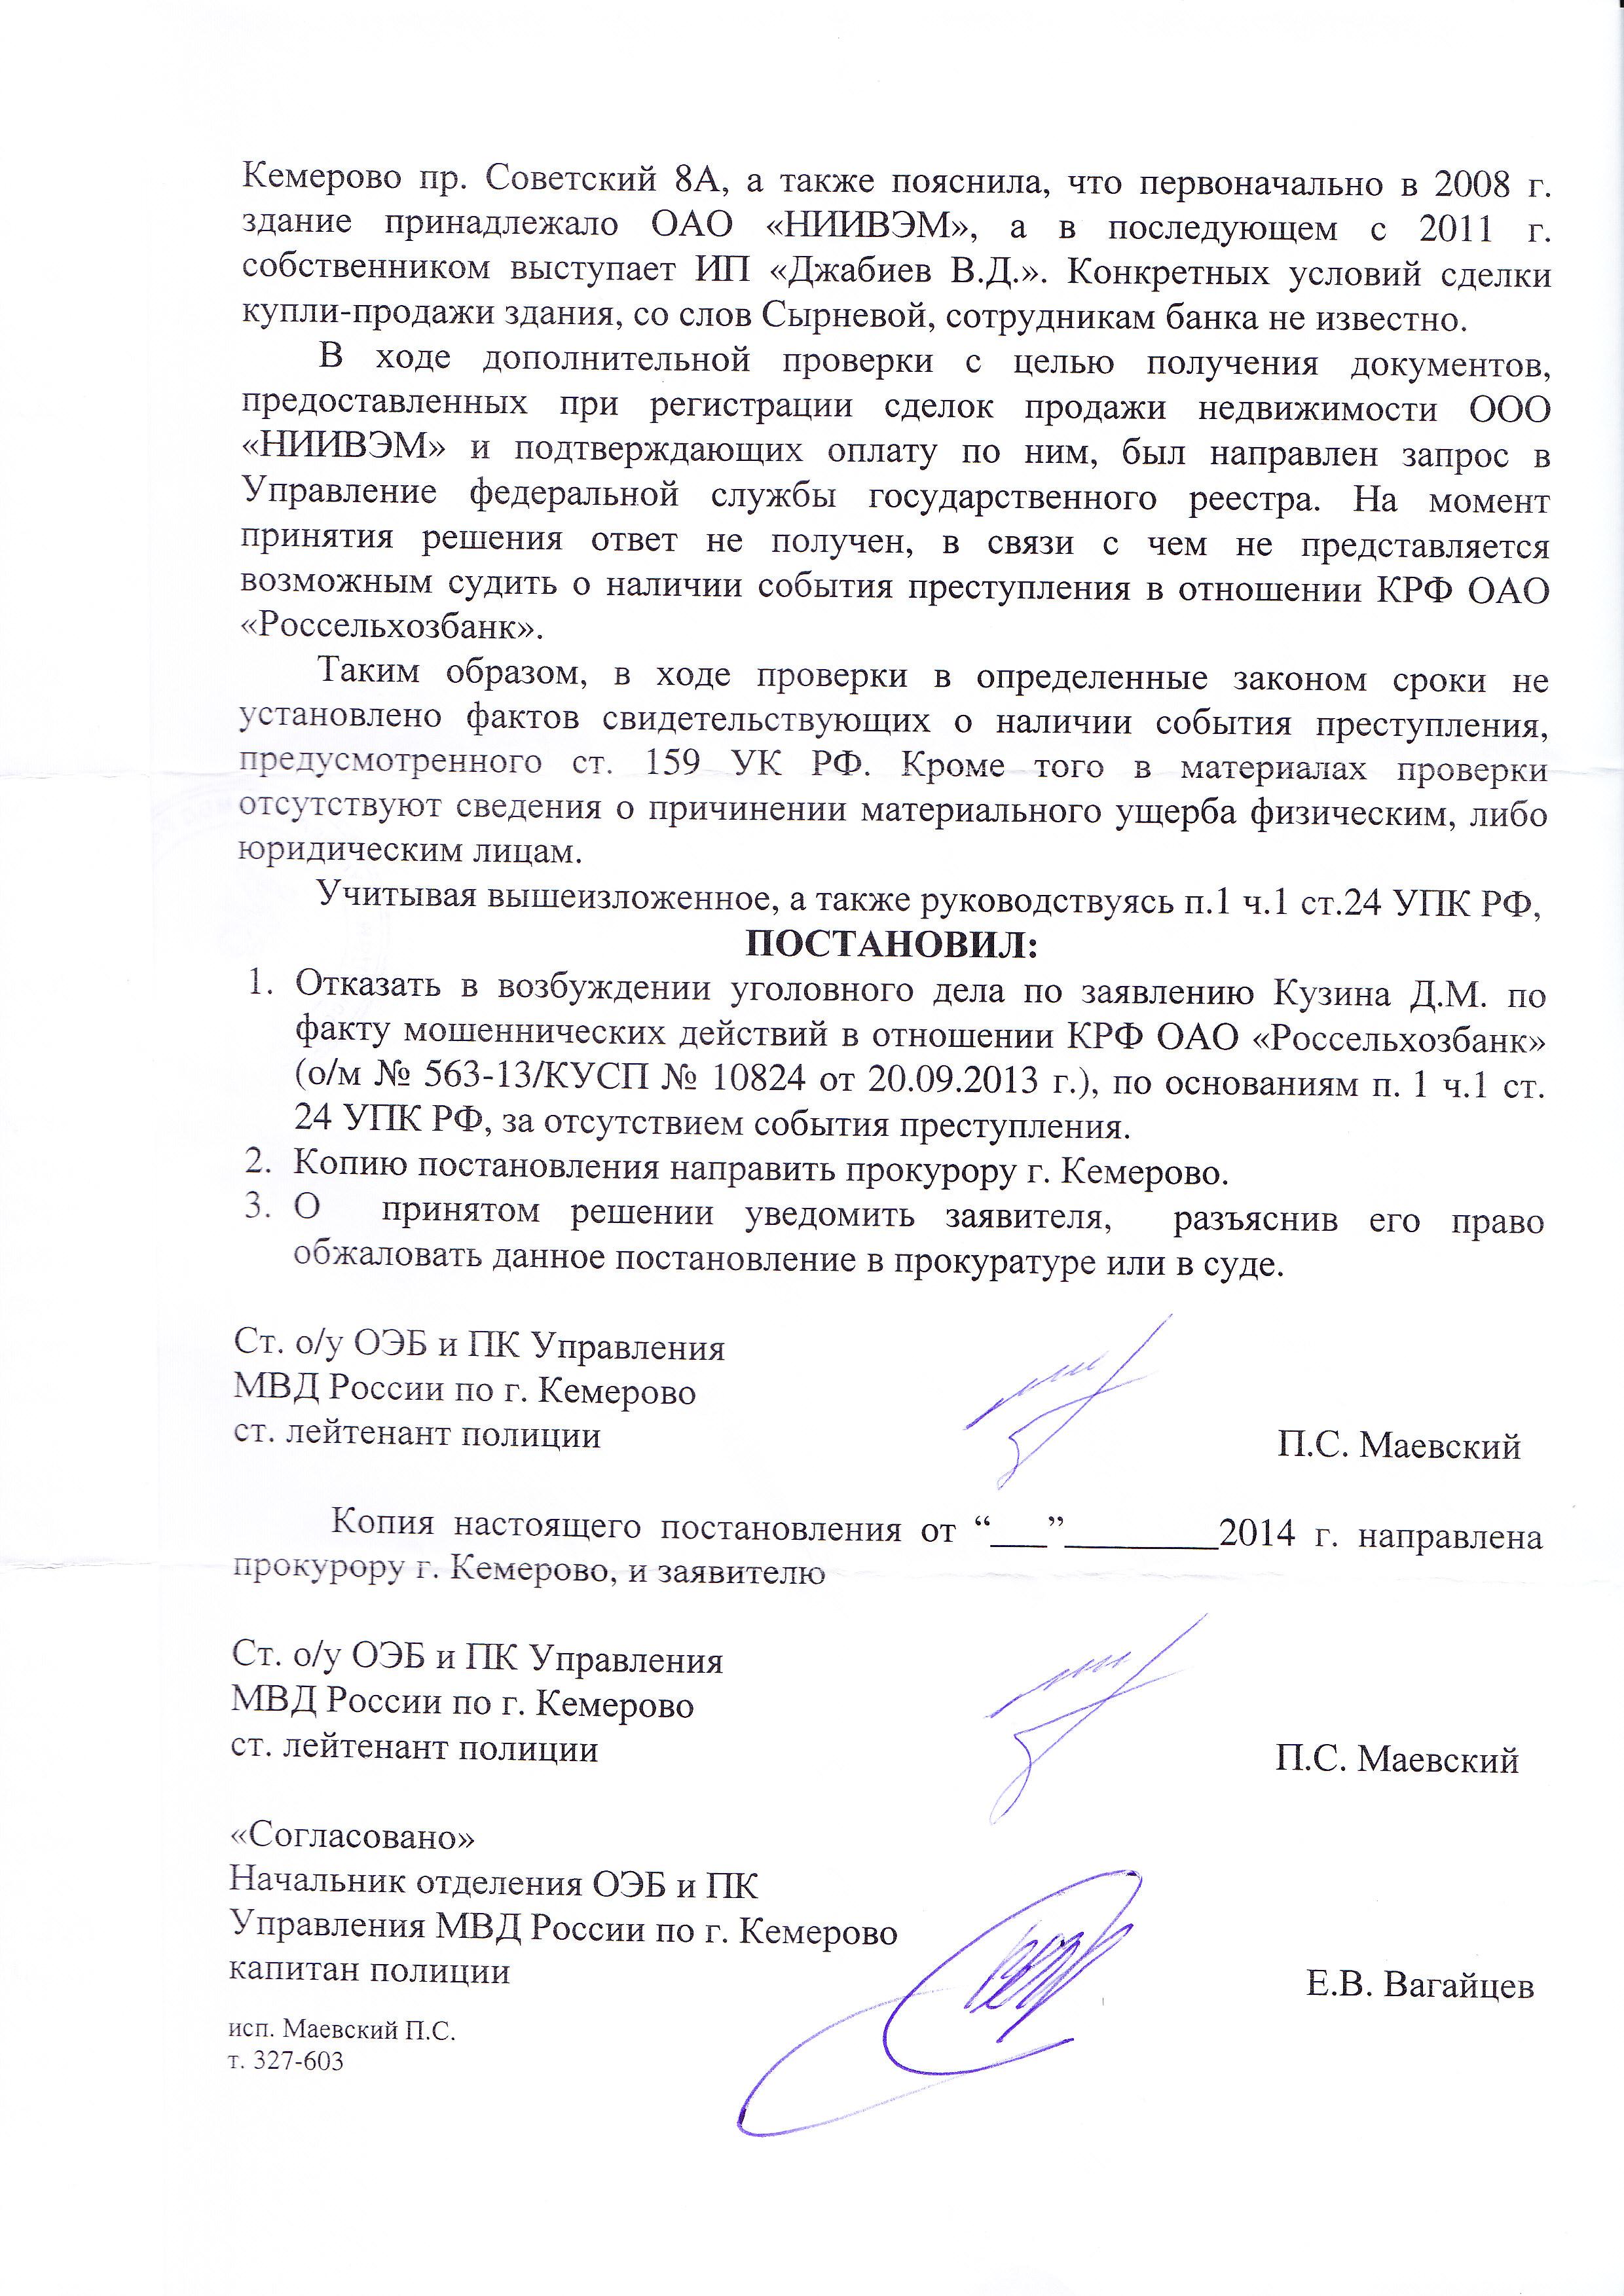 Постановление об отказе от 14 11 2014 - 2 л.